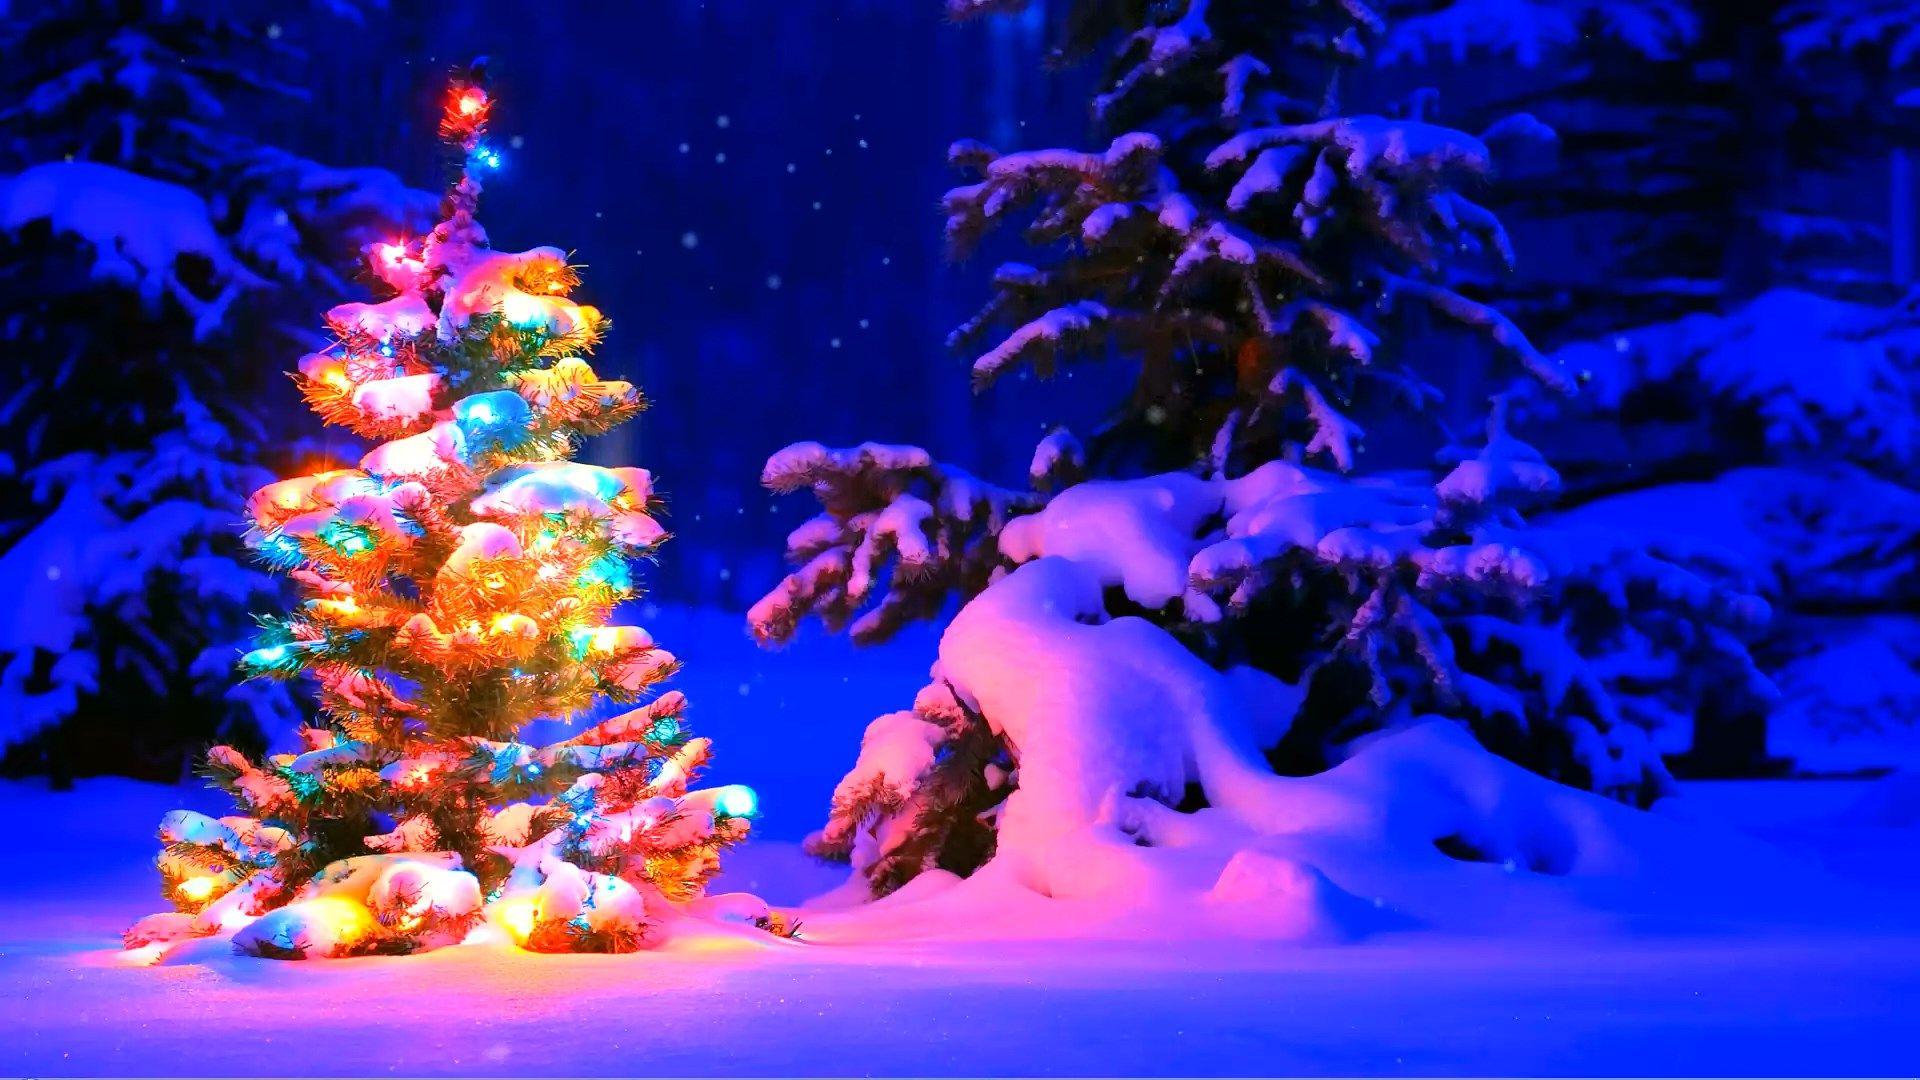 Christmas Tree Wallpaper Theme